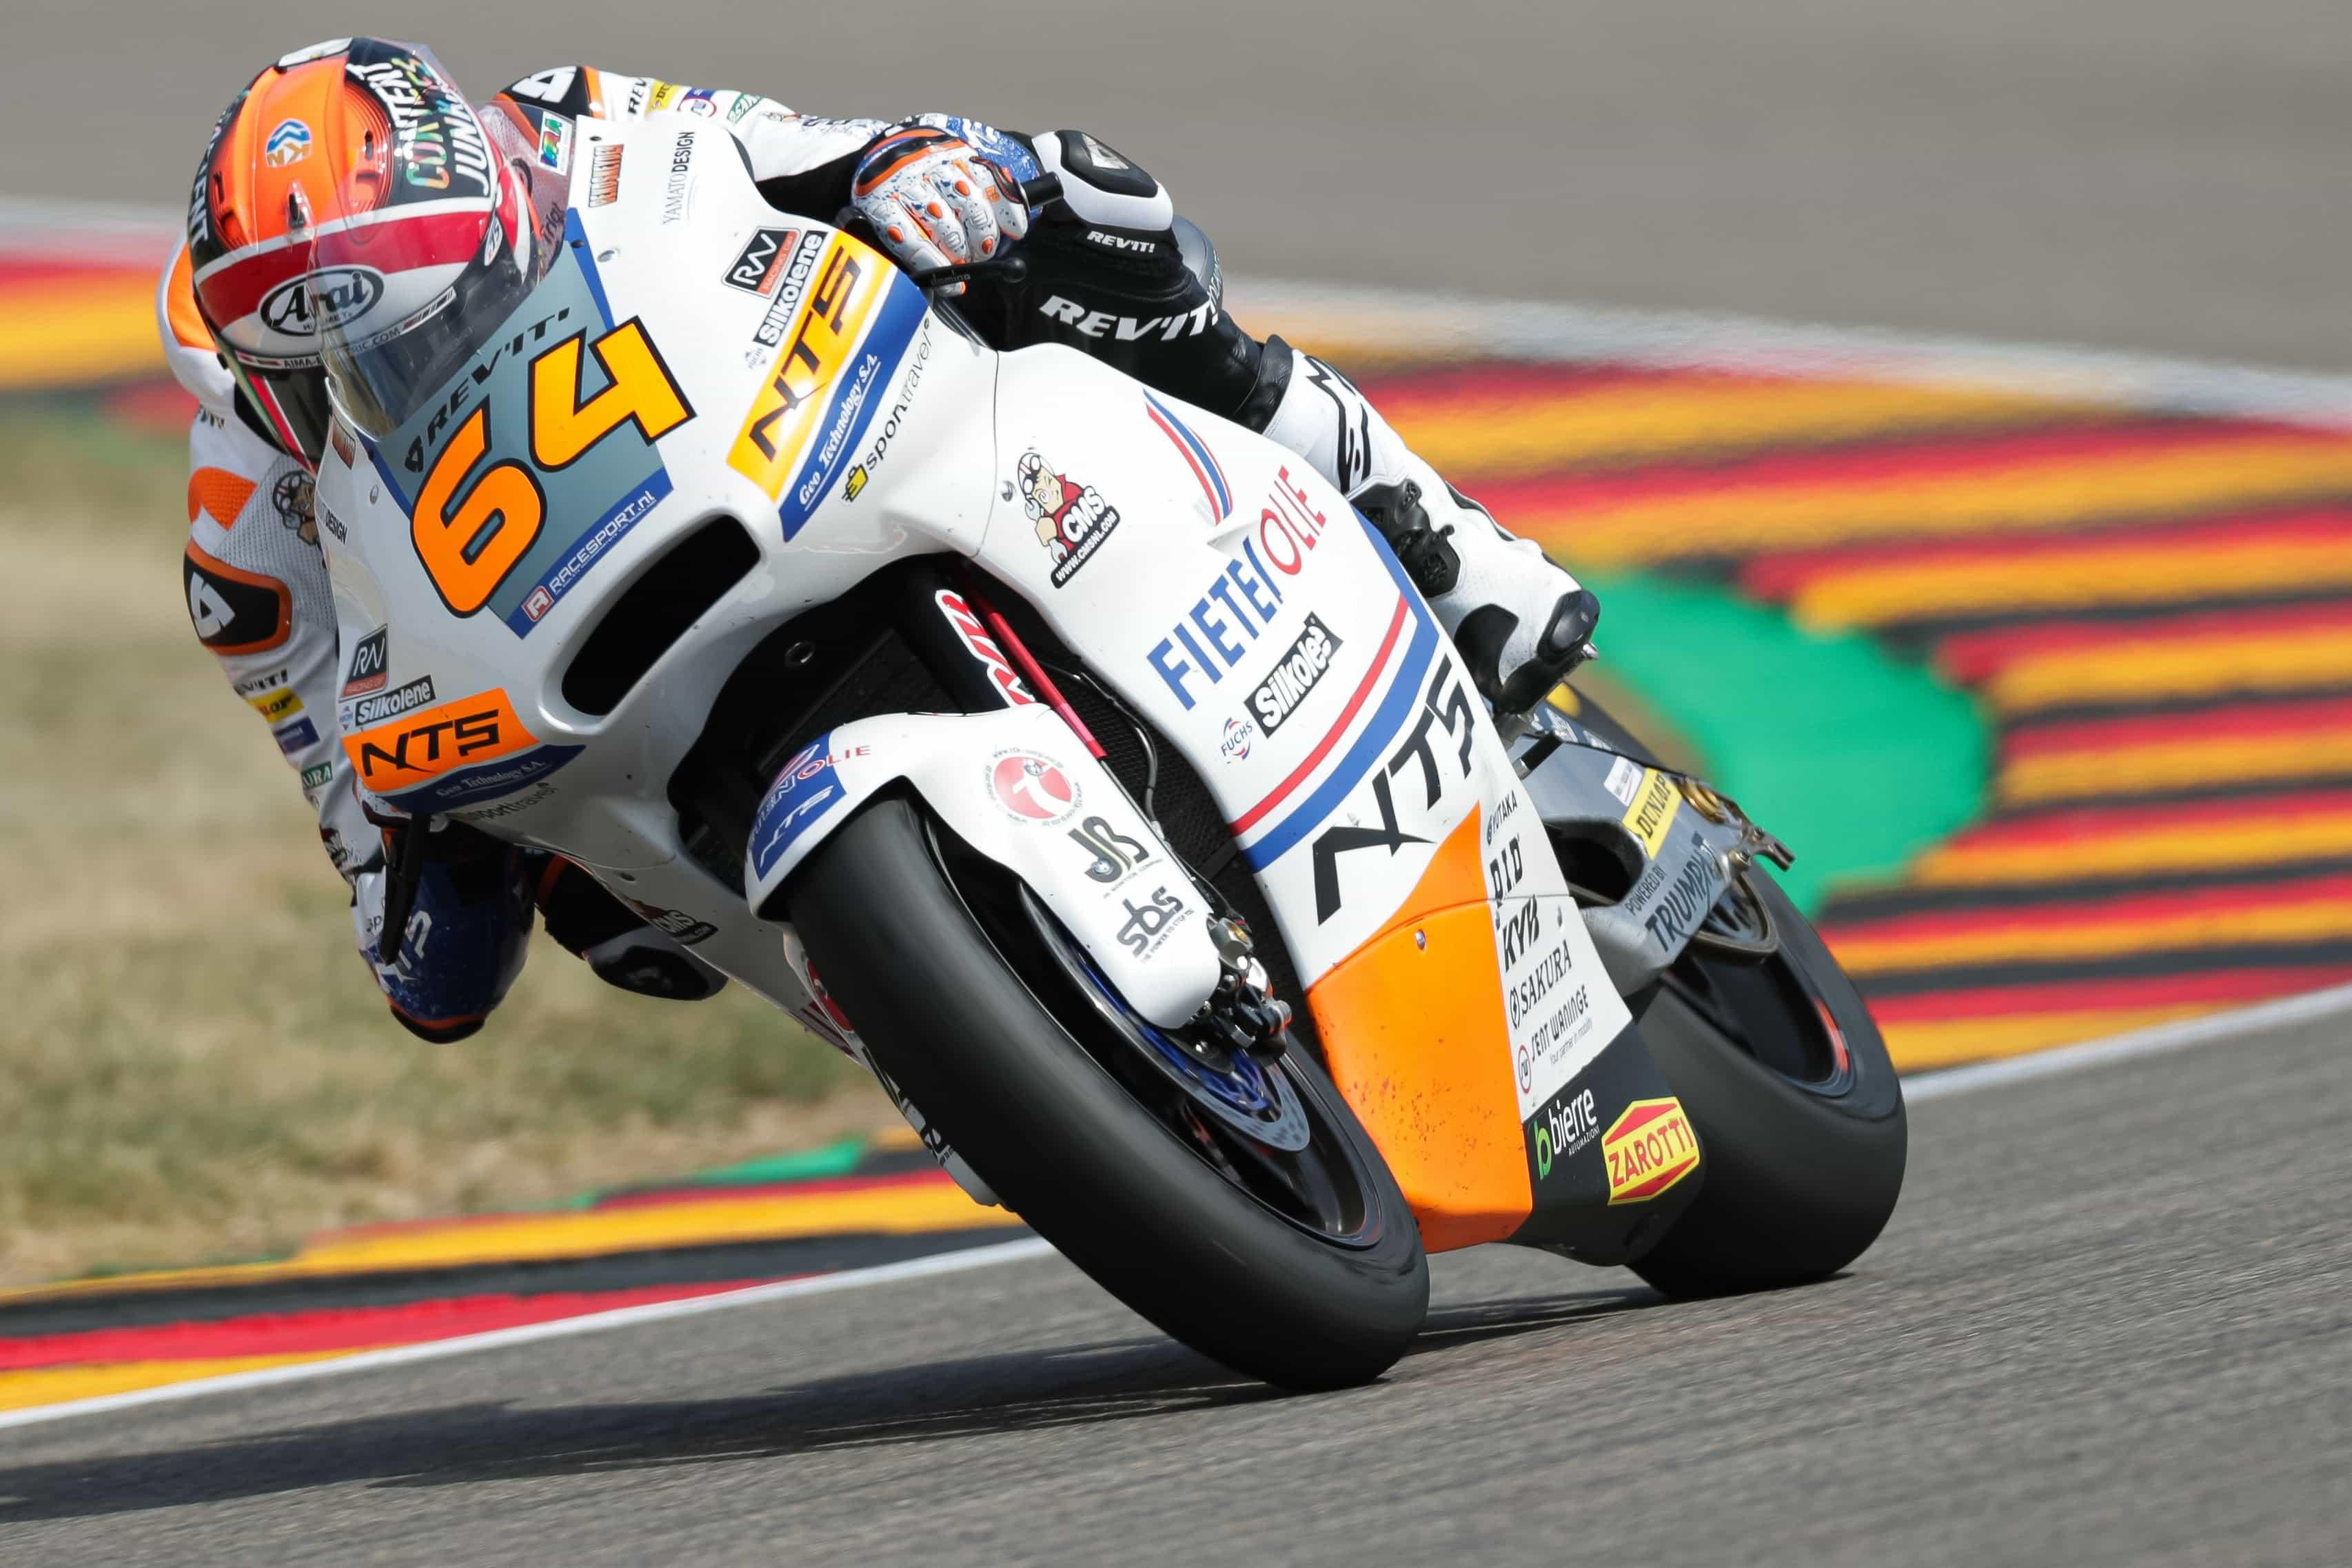 NTS RW Racing GP ドイツGP 公式練習 3、公式予選レポート